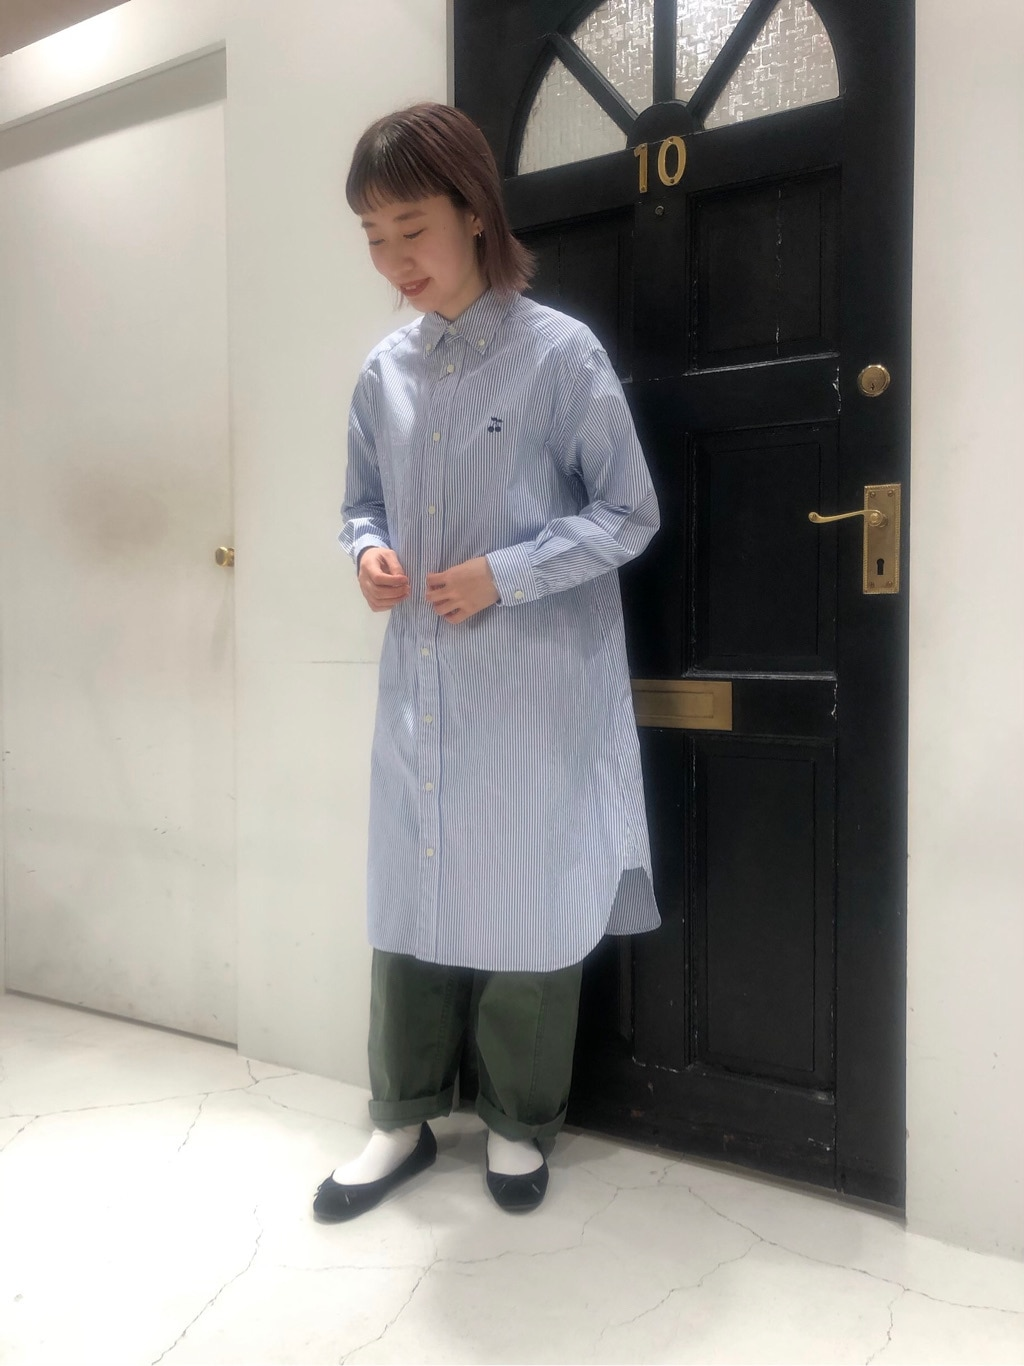 Dot and Stripes CHILD WOMAN ルクアイーレ 身長:157cm 2021.01.27